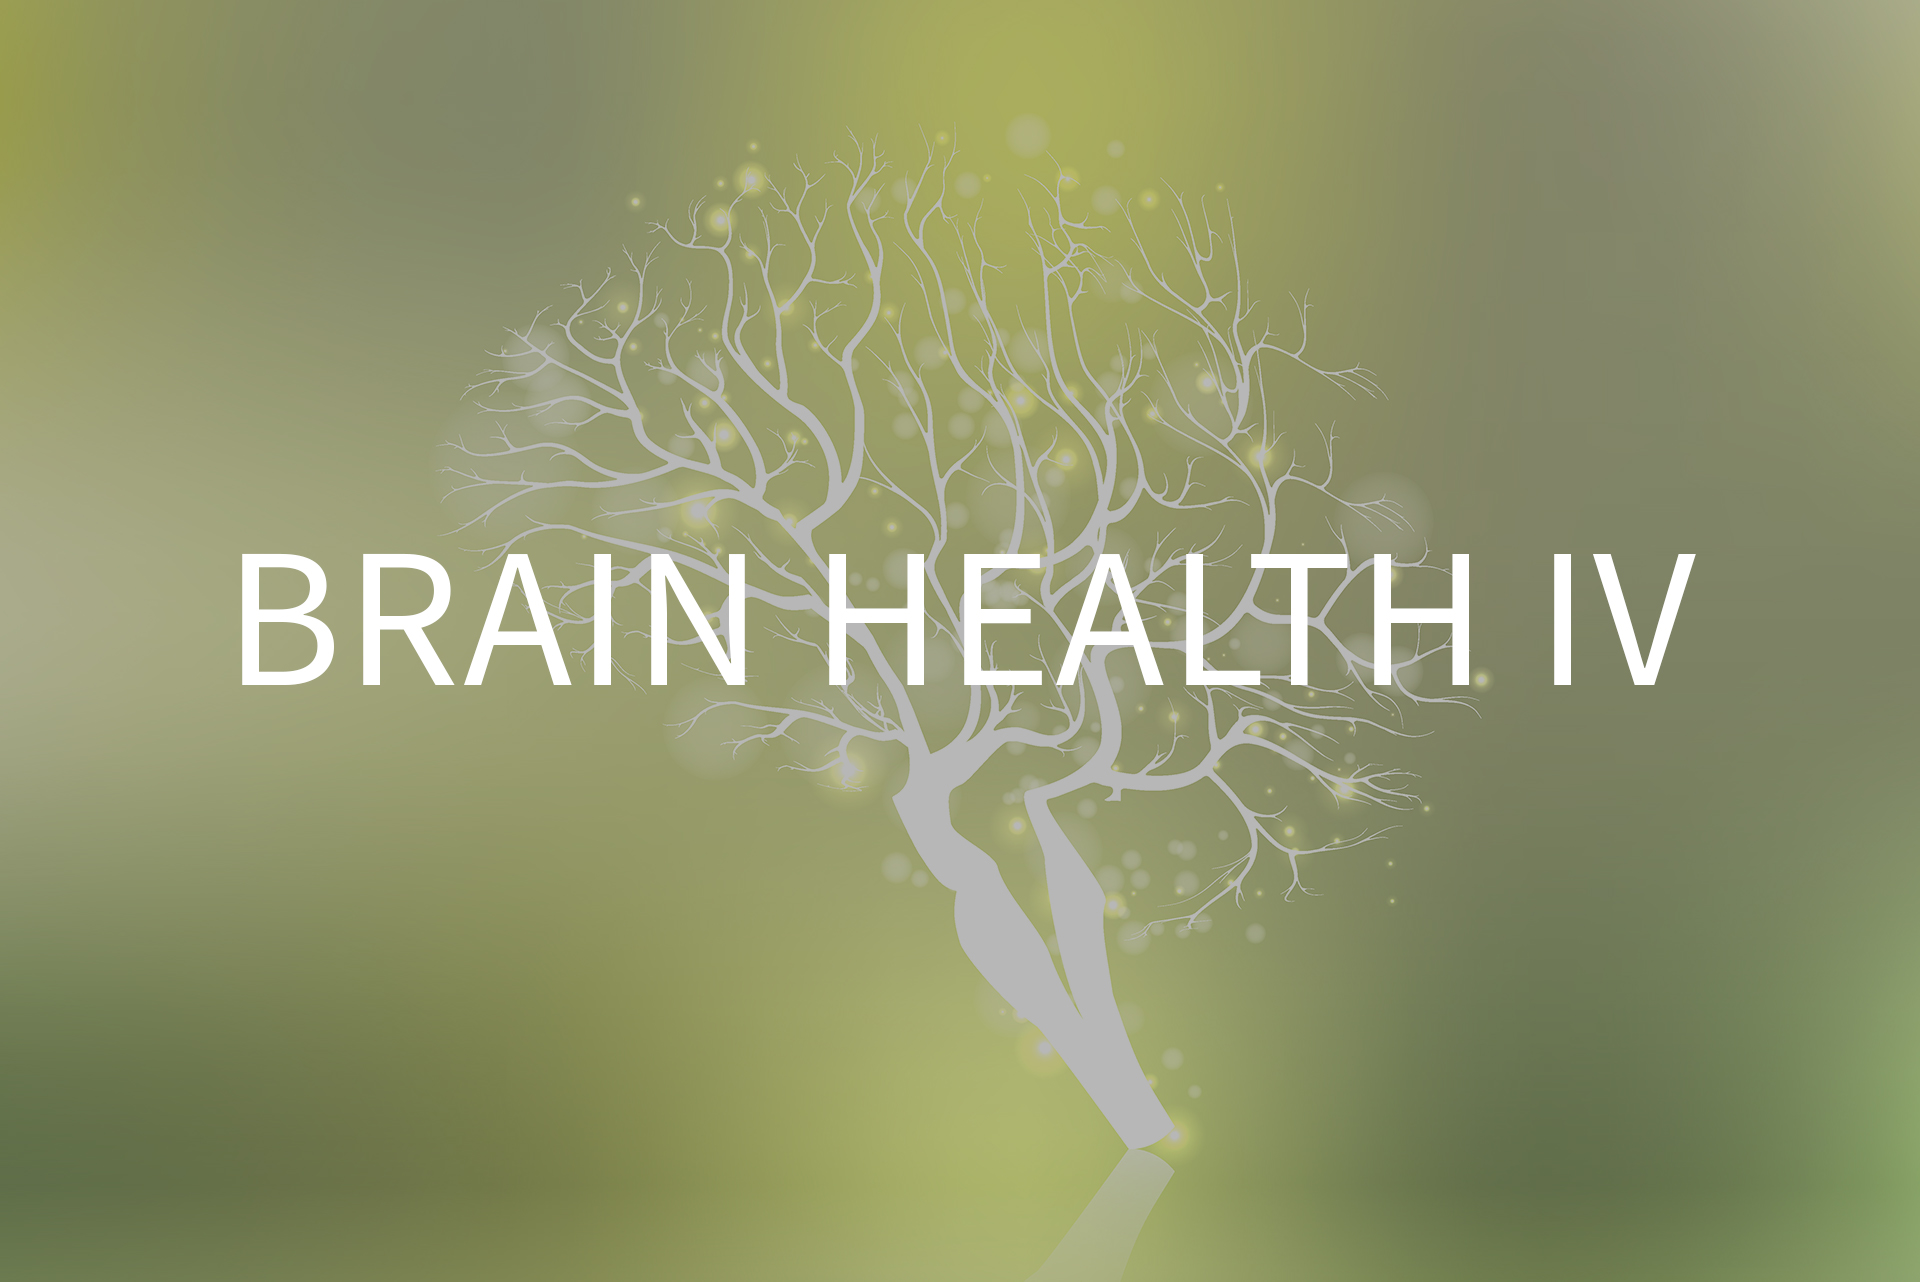 Emerald Brain Health IV